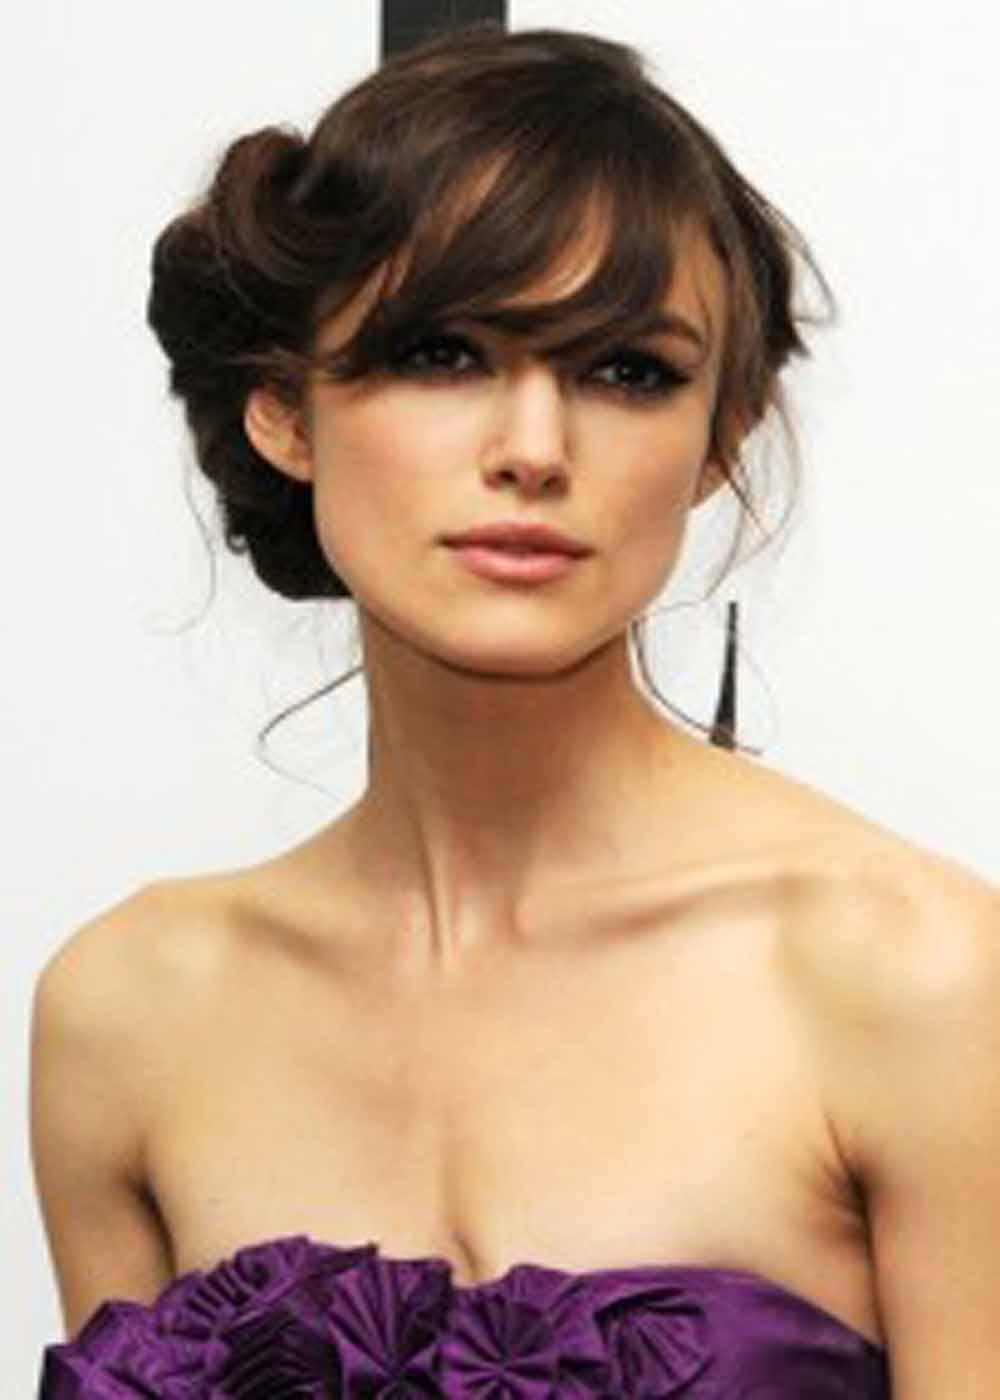 Excellent Girls Curly Updos Hairstyles 2011 Prom Hairstyles Short Hairstyles Gunalazisus